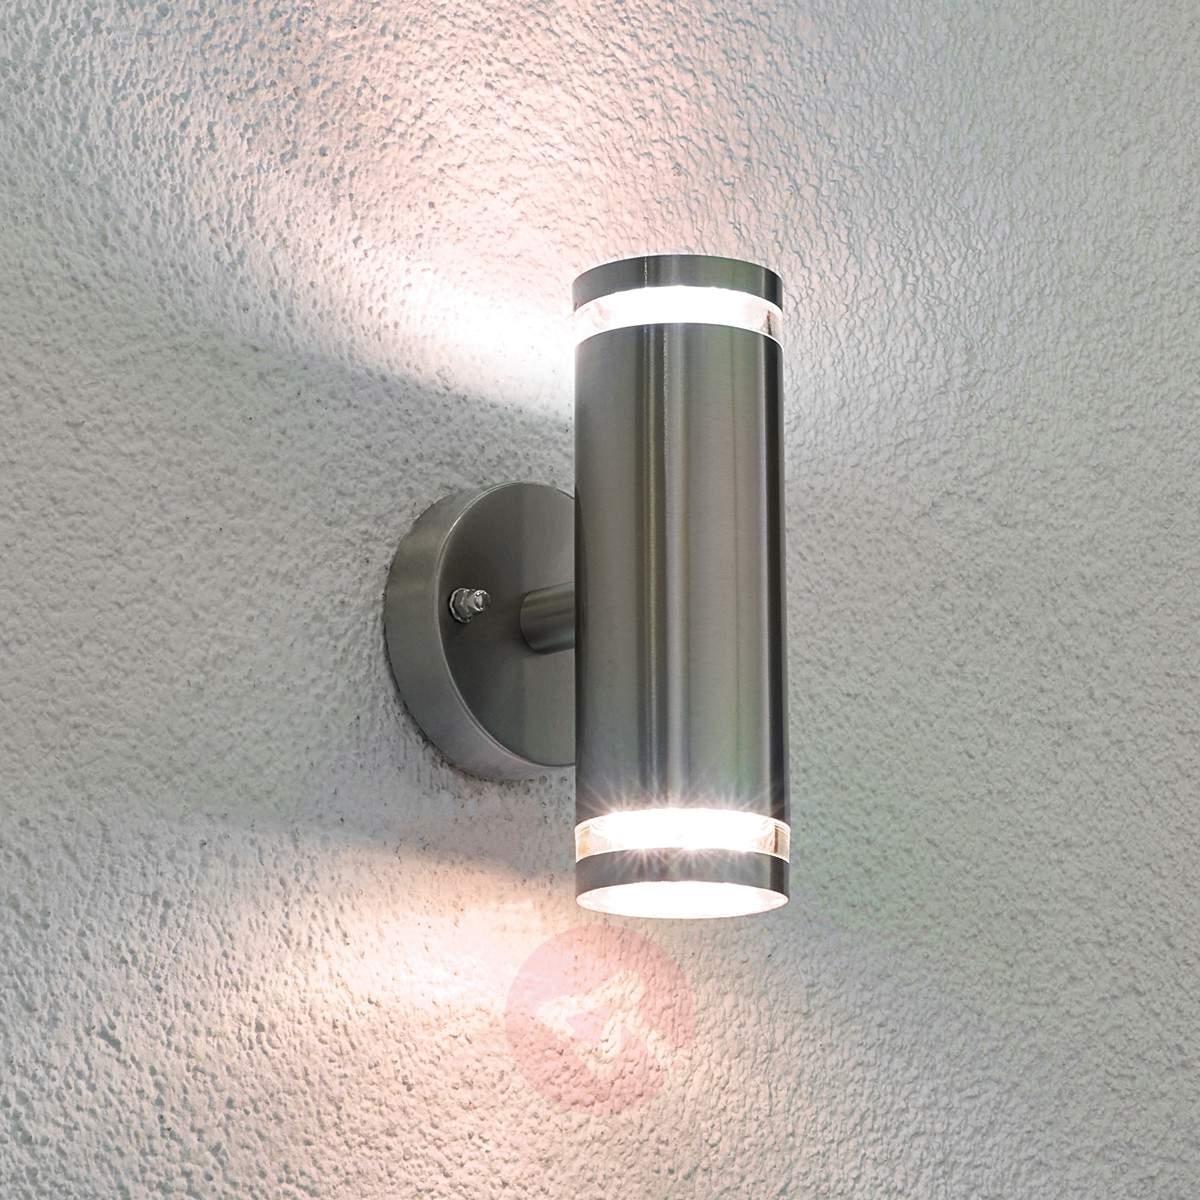 Ip65 Outdoor Wall Lights Regarding Most Recently Released Led Wall Lights Outdoor – Outdoor Designs (View 18 of 20)